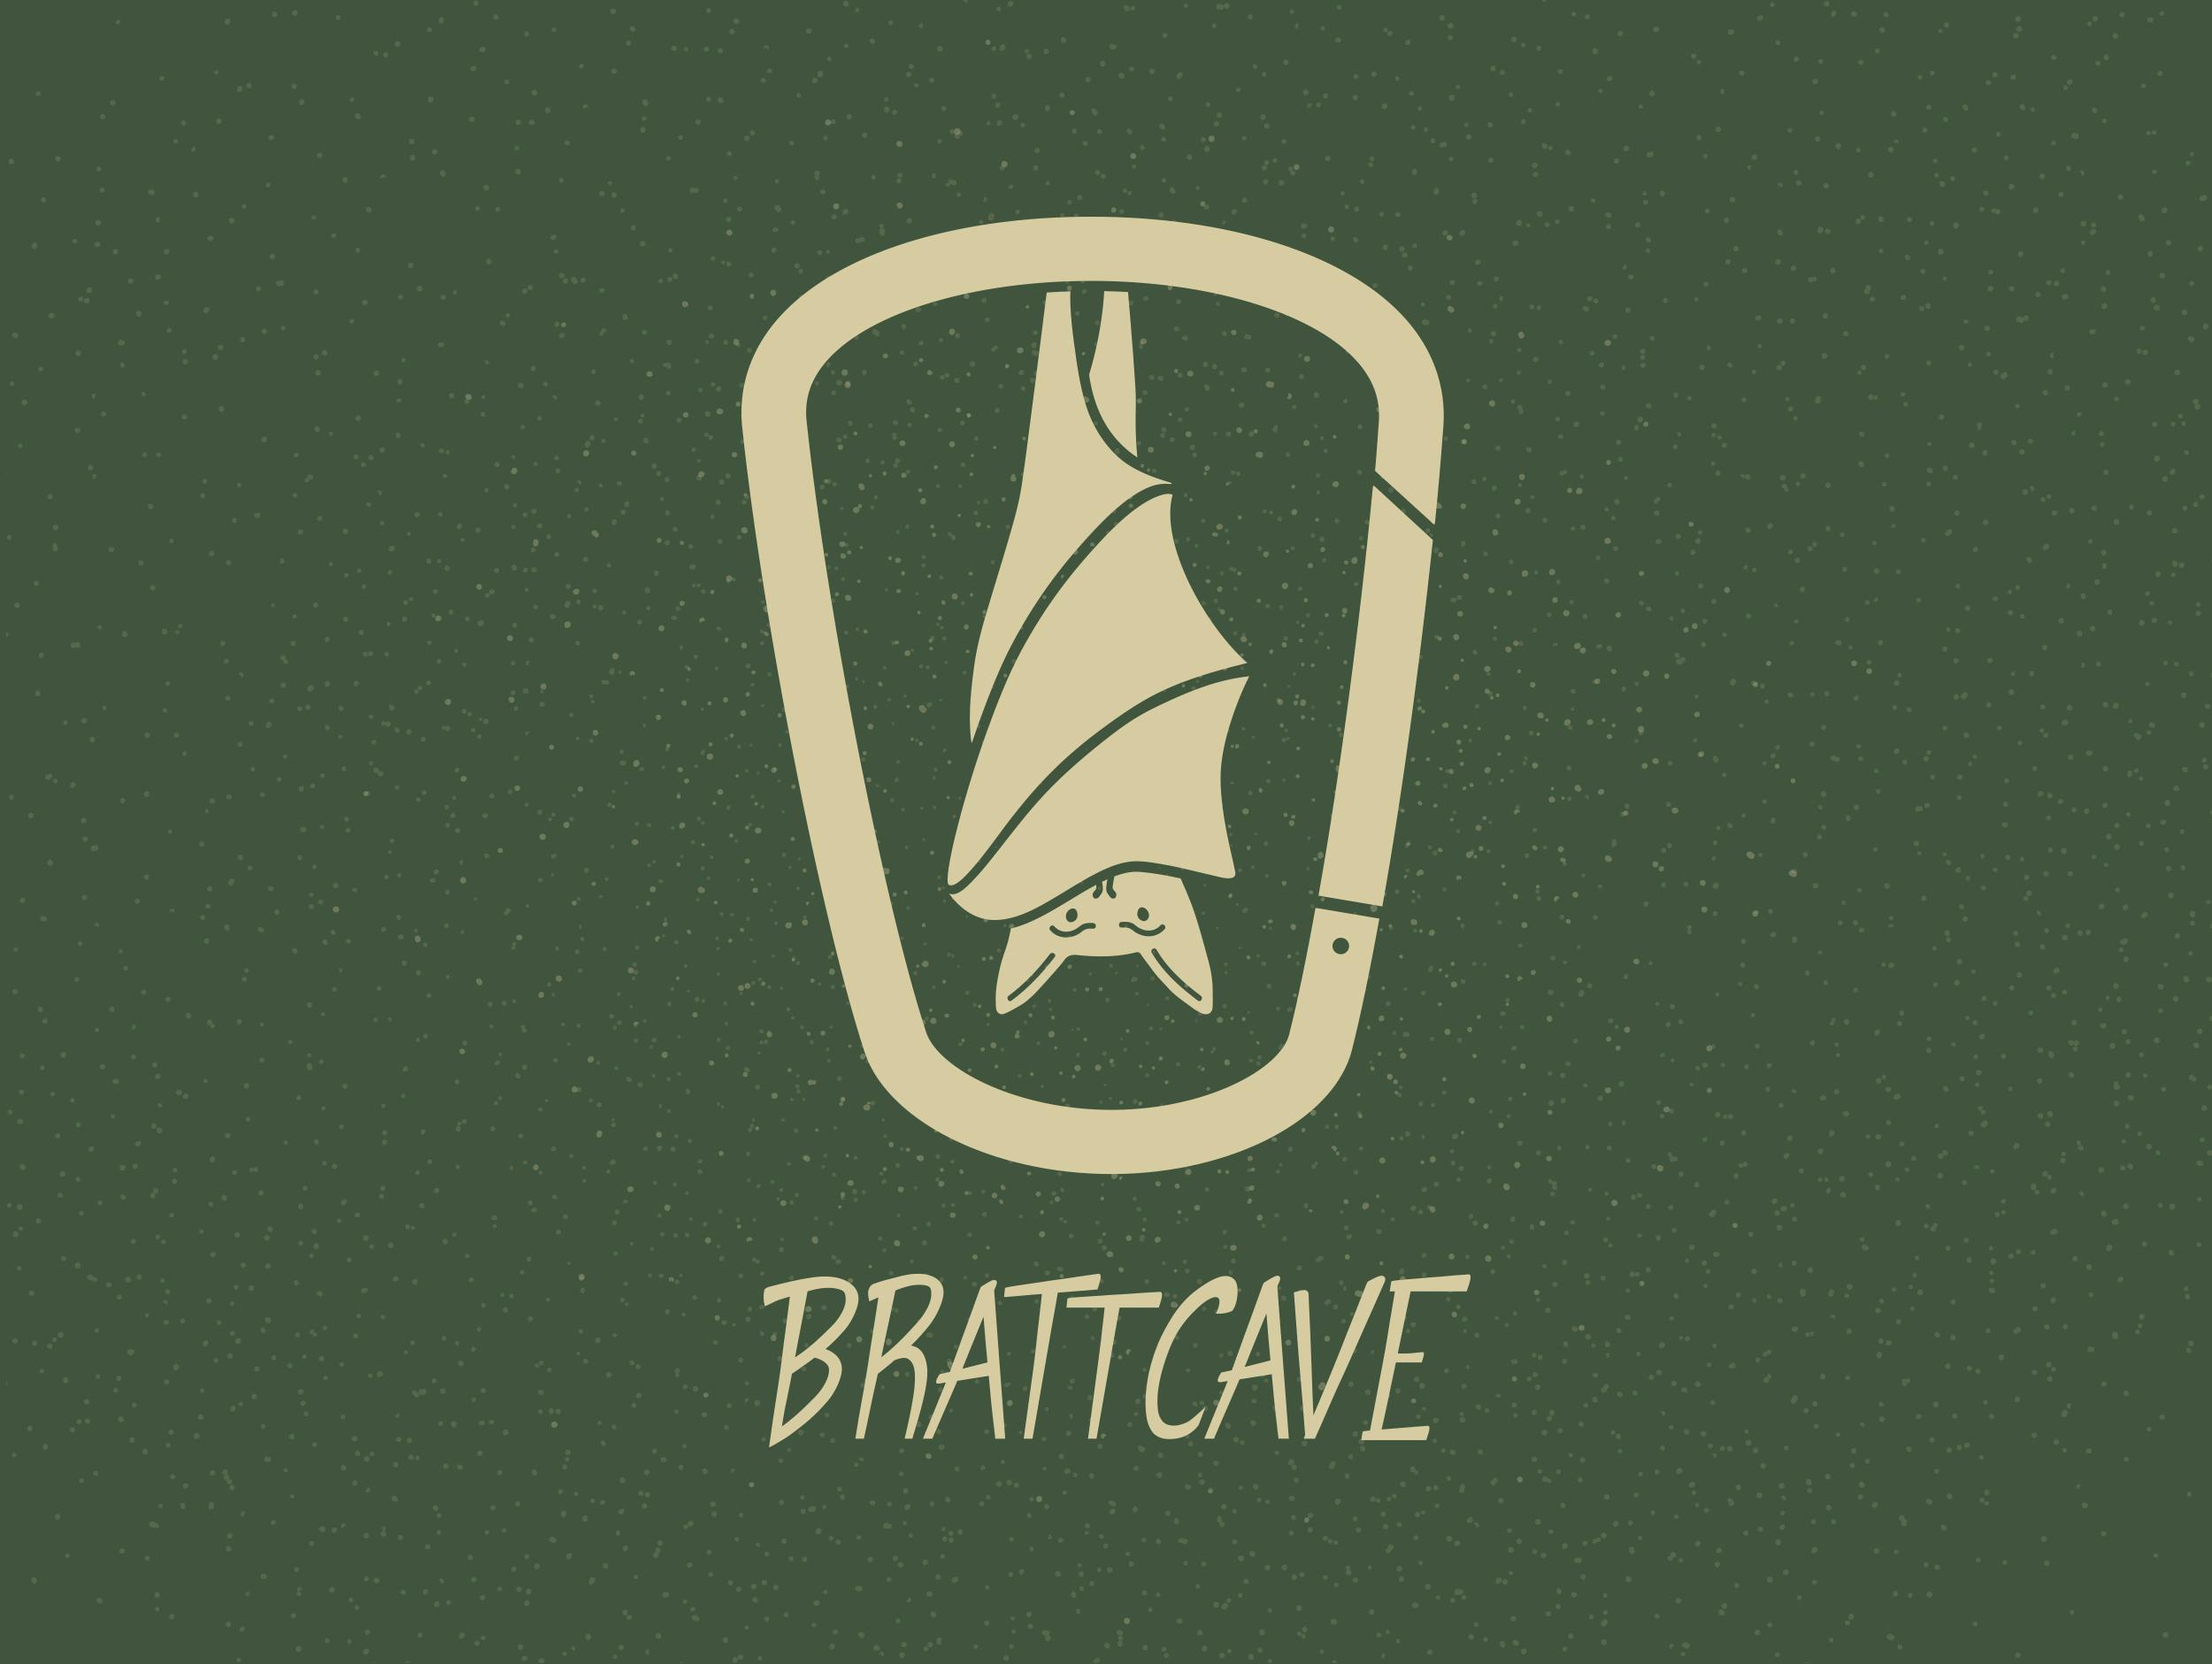 BrattCaveVerticalLogo.jpg